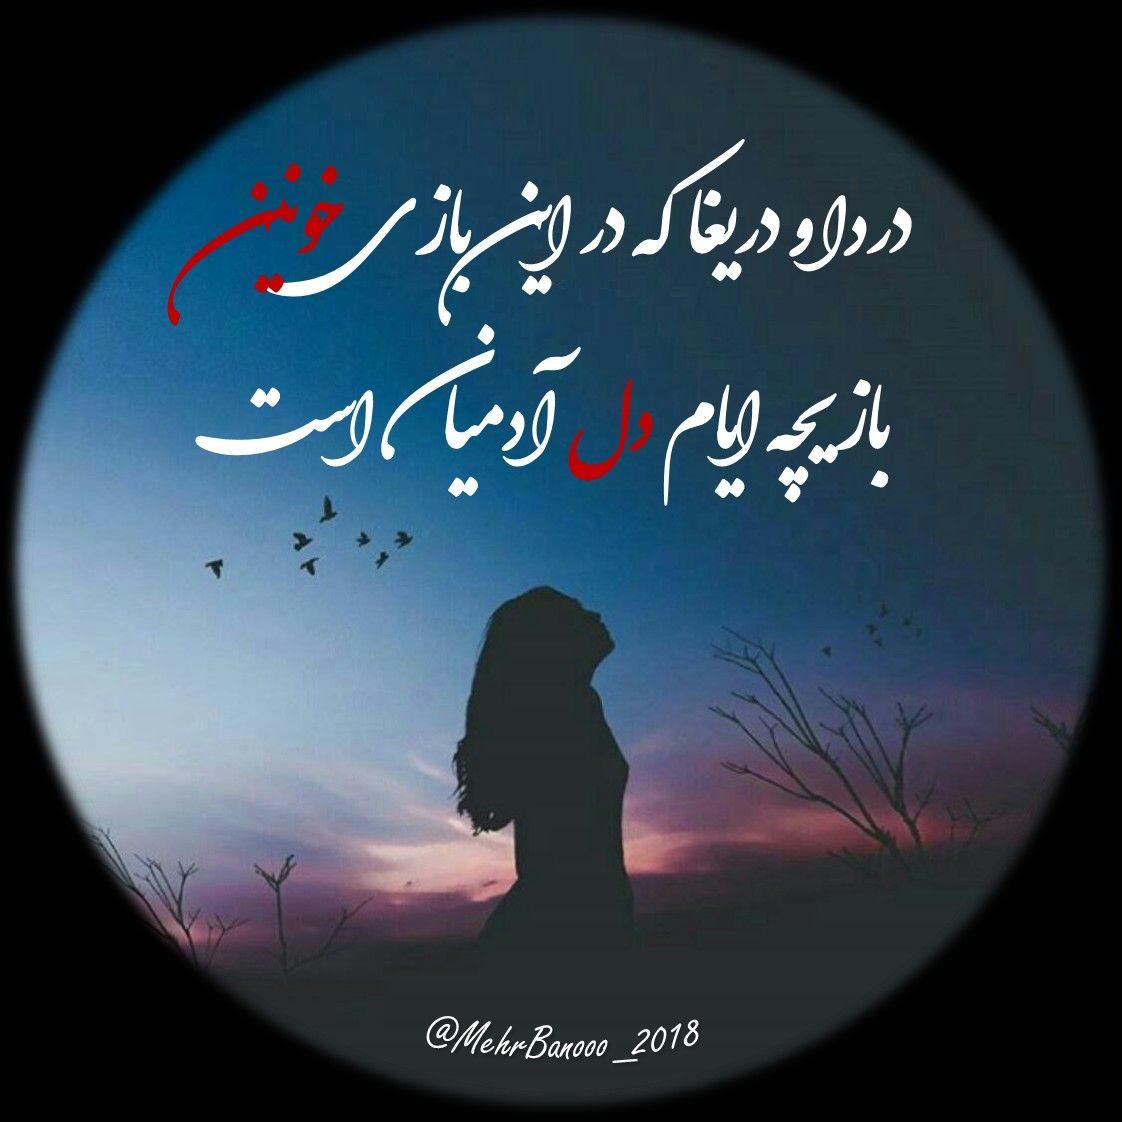 عکس نوشته عکس پروفایل شعر کانال تلگرام مهر بانو ۲۰۱۸ Mehrbanooo 2018 Neon Signs Persian Poem Poems